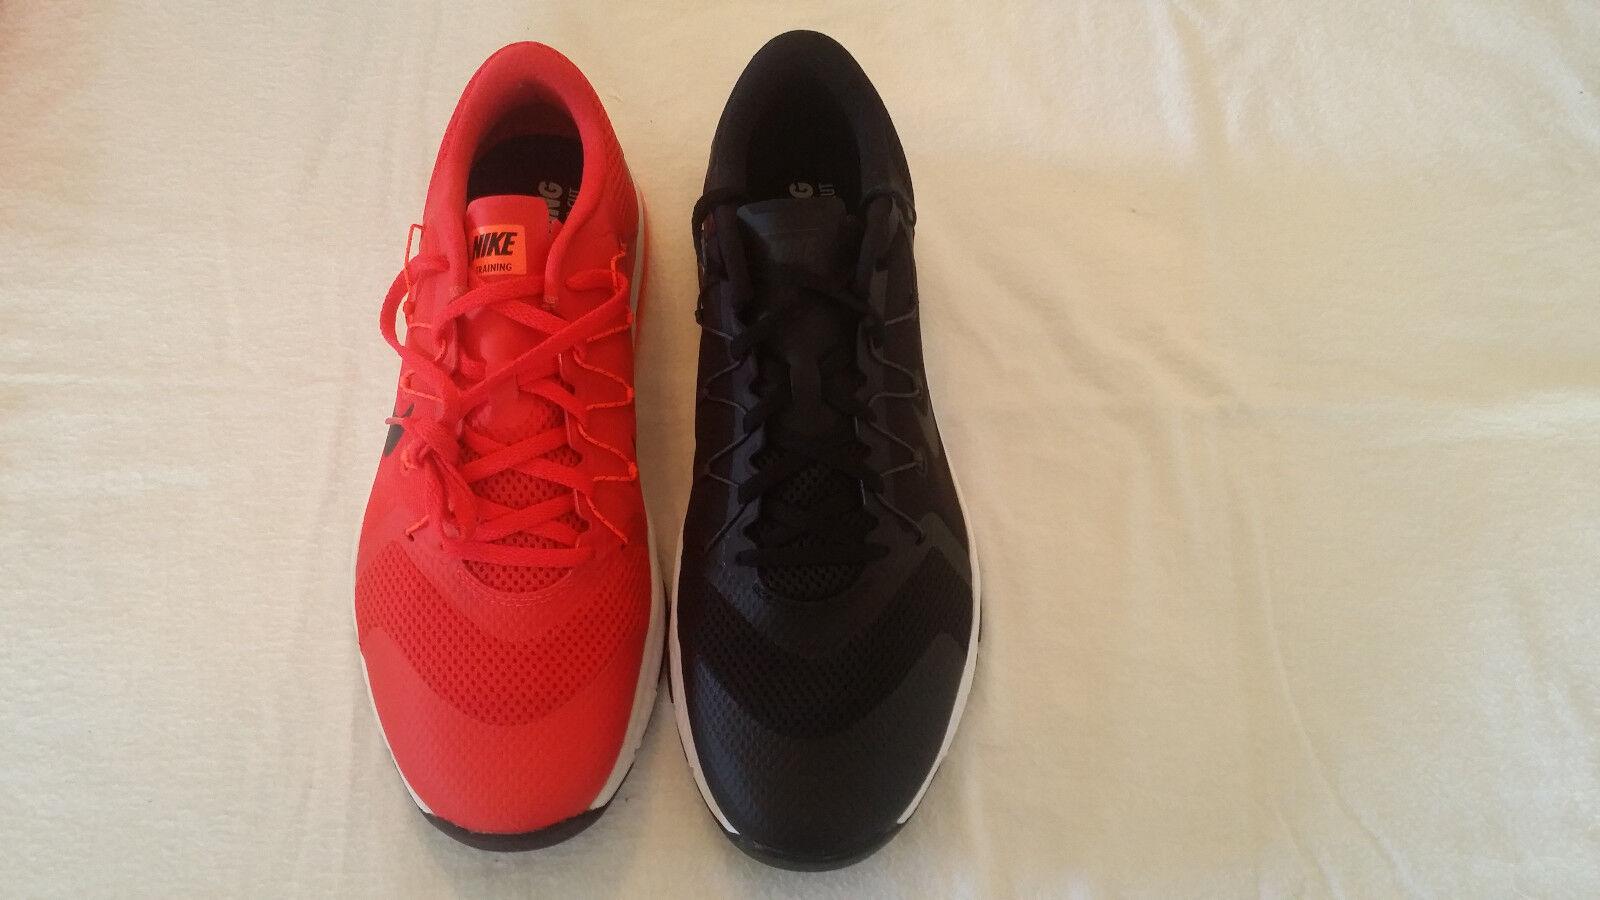 Nike GENUINE Men's Zoom Train Complete! Brand New! Very Good Quality! Stylish!